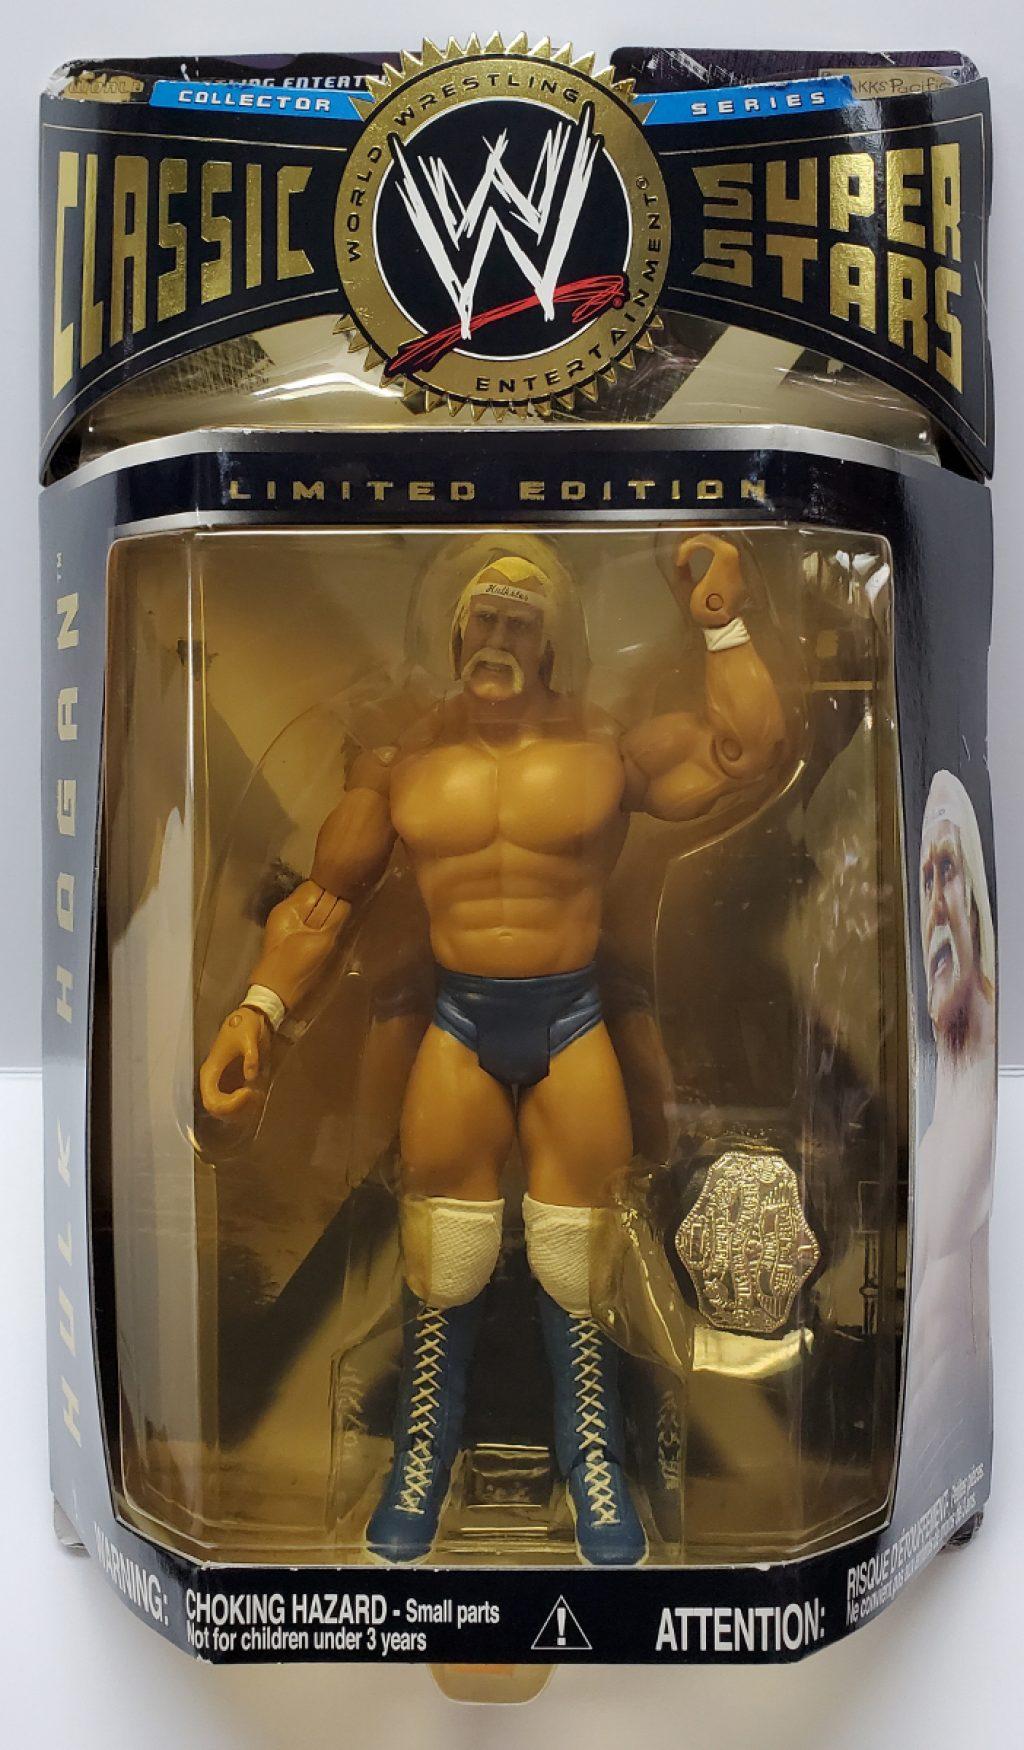 WWE Classic Super Stars Hulkster Hulk Hogan Action Figure 1